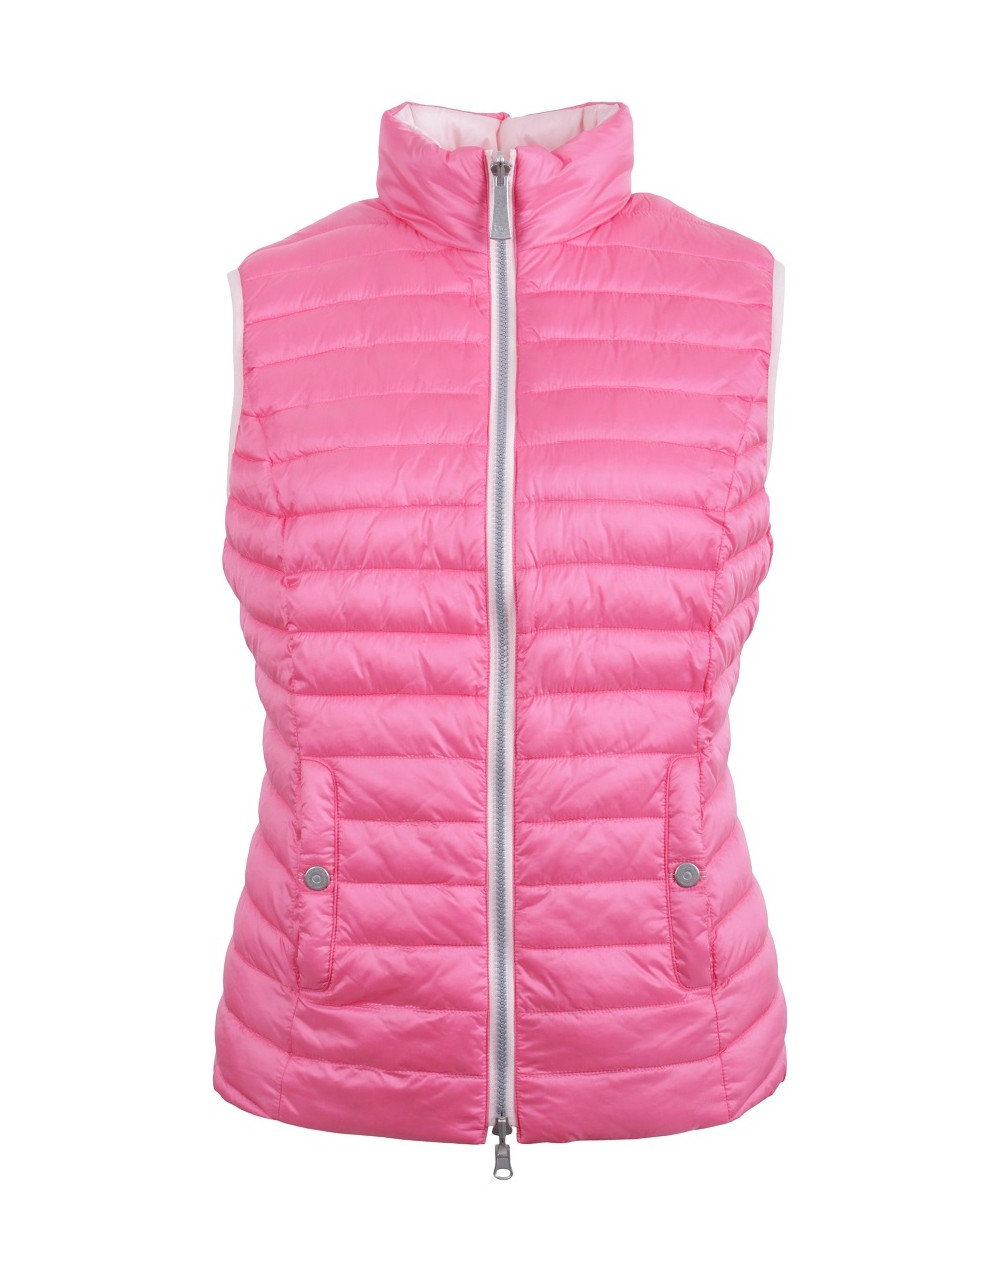 Lebek Reversible Pink Lady Gilet|Lebek|55110002|Irish Handcrafts -1